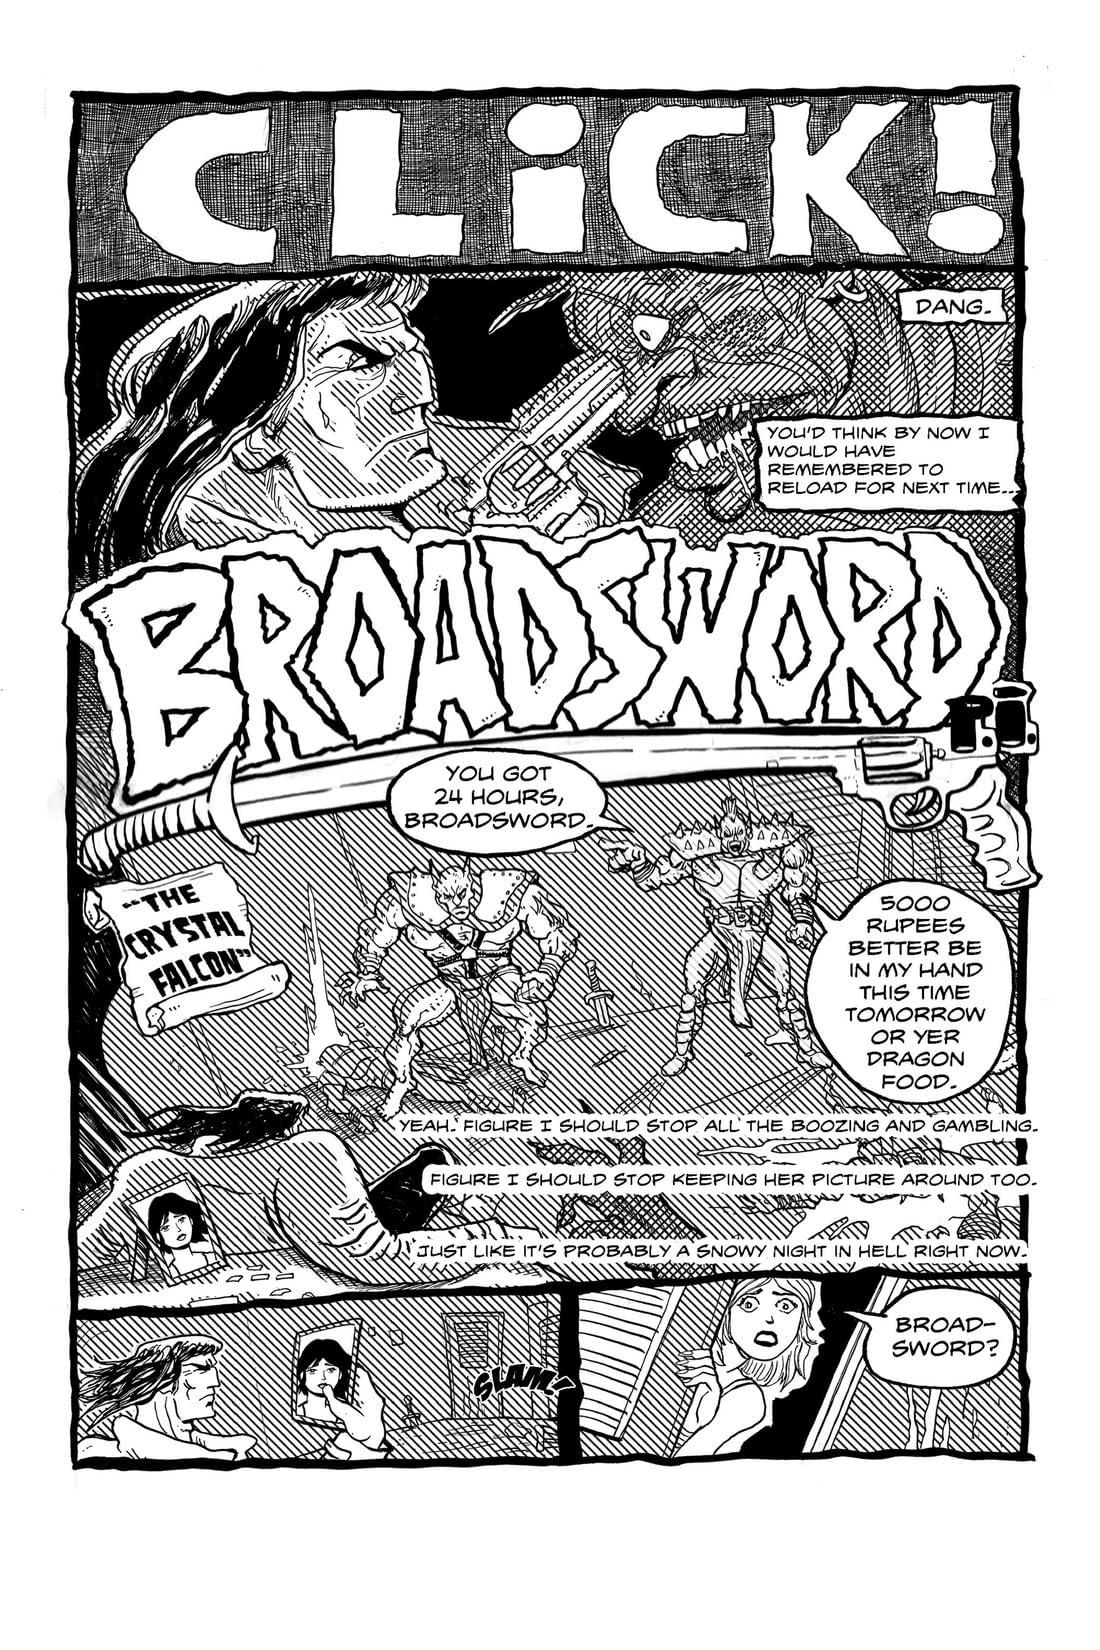 Broadsword, P.I. #1